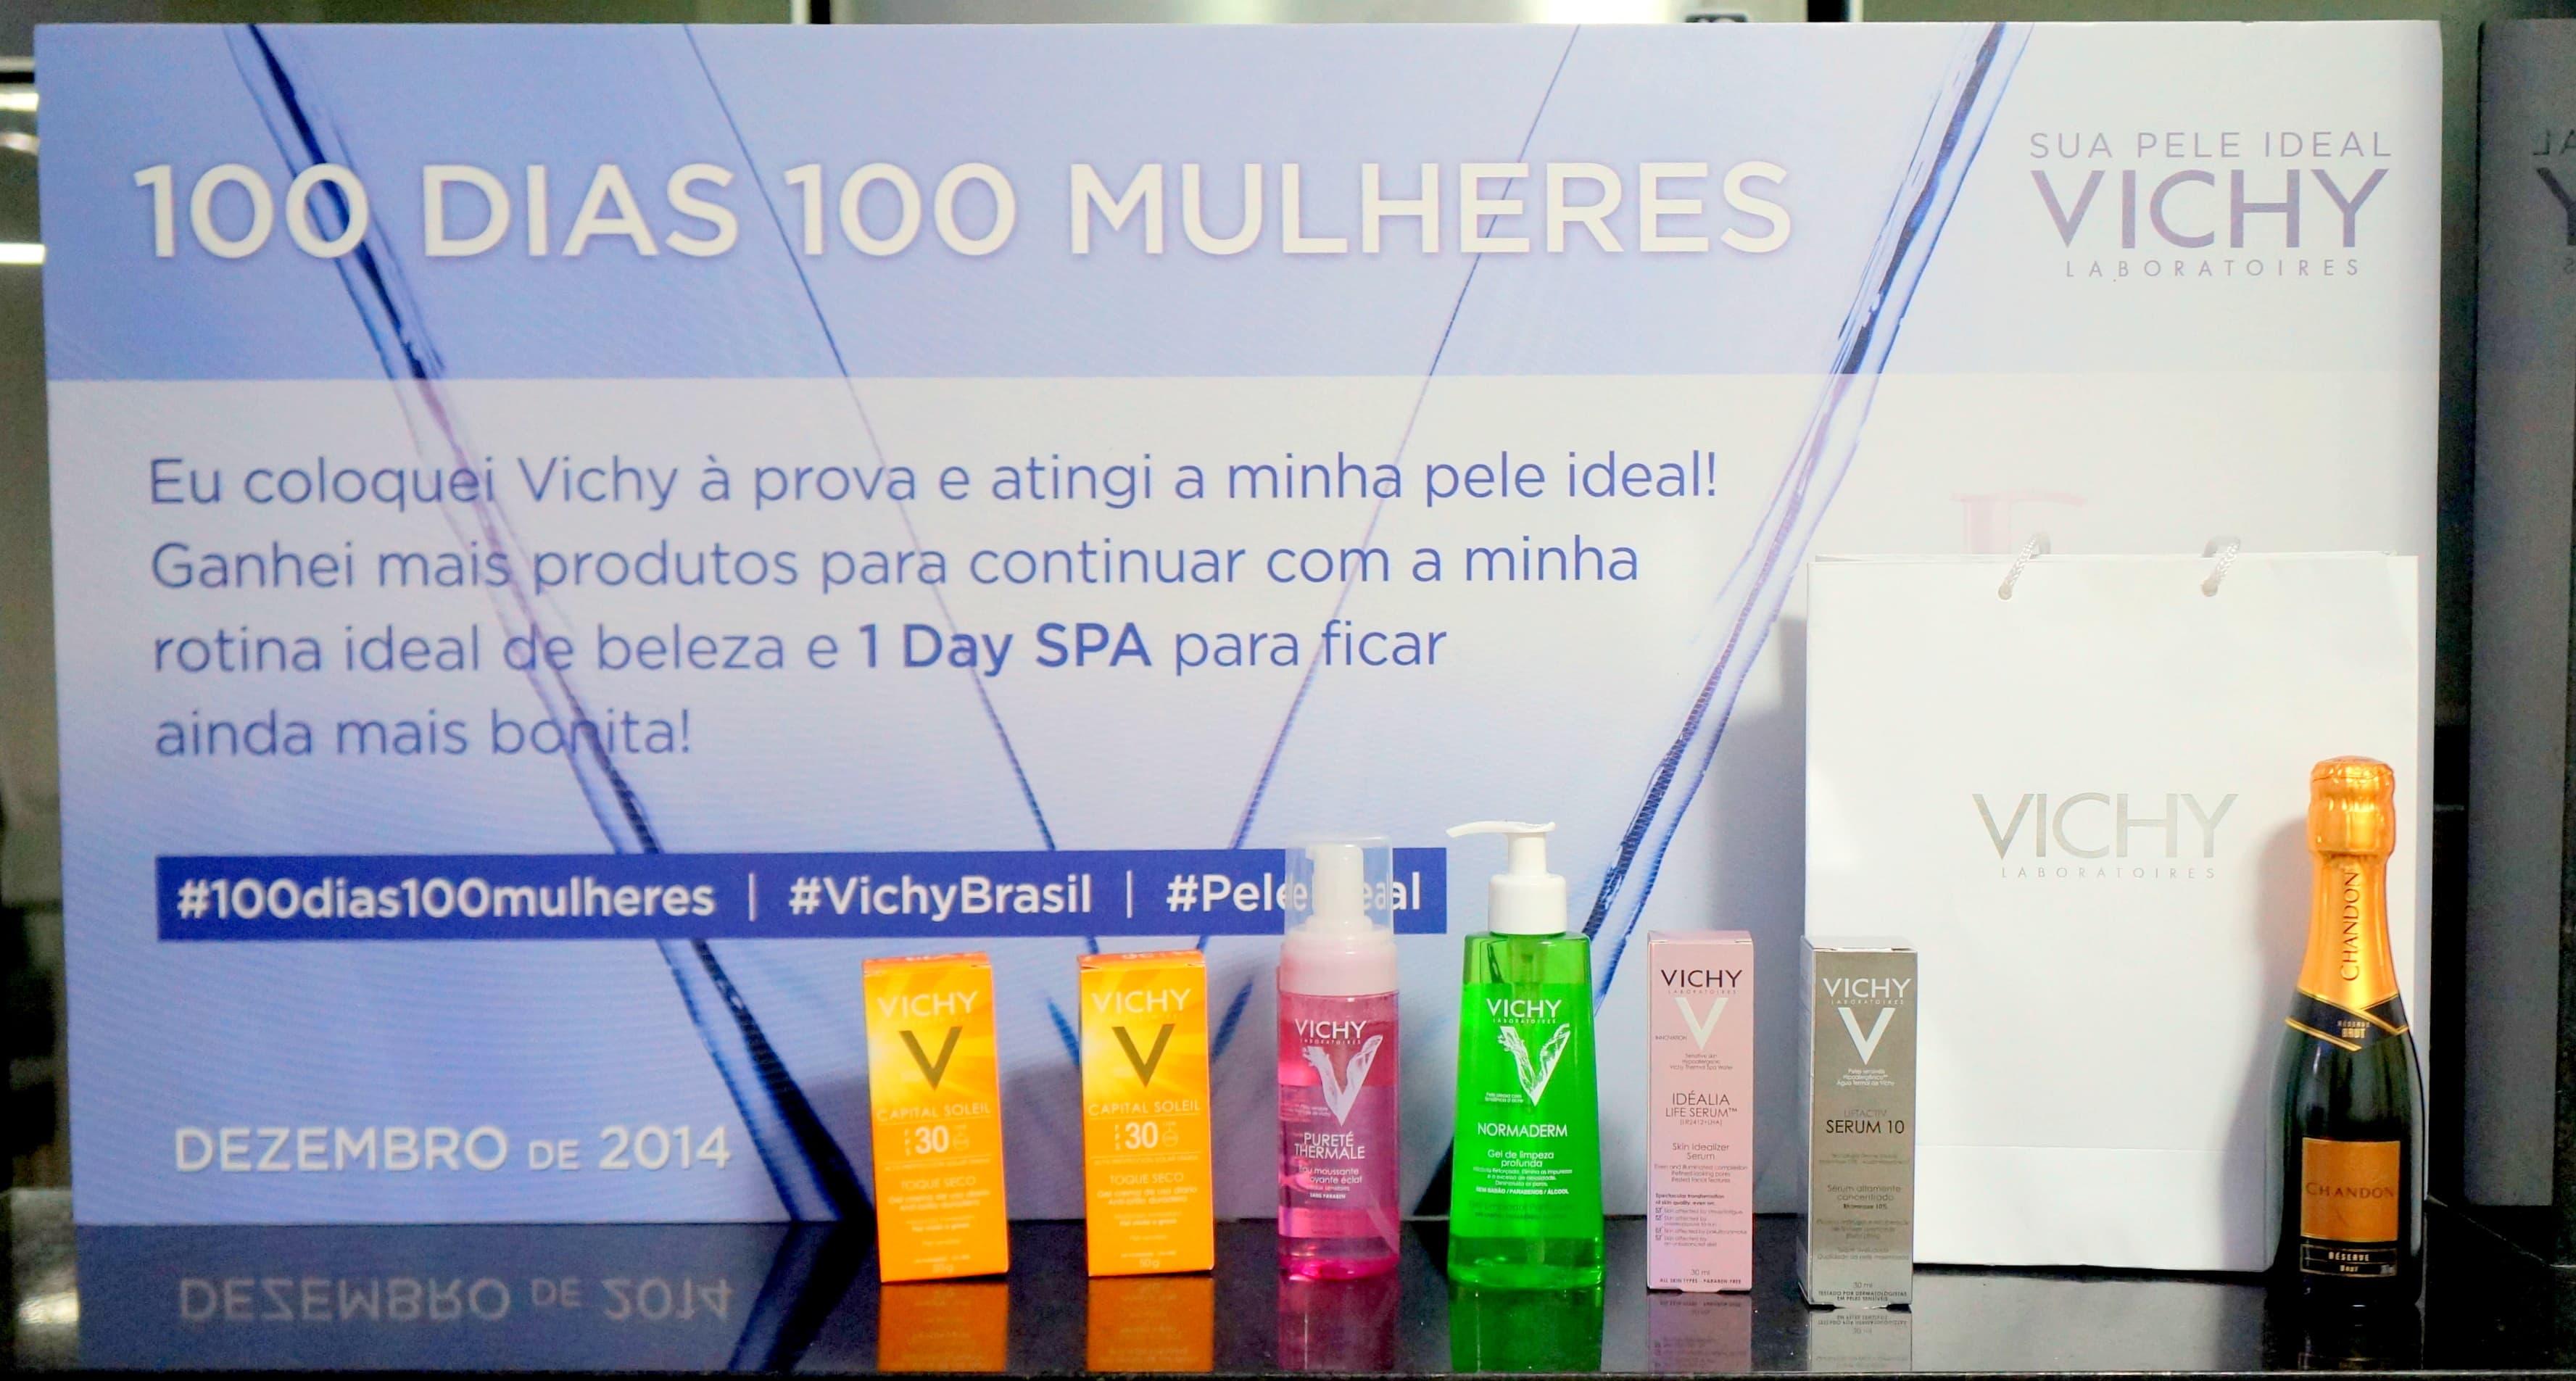 100 dias 100 mulheres